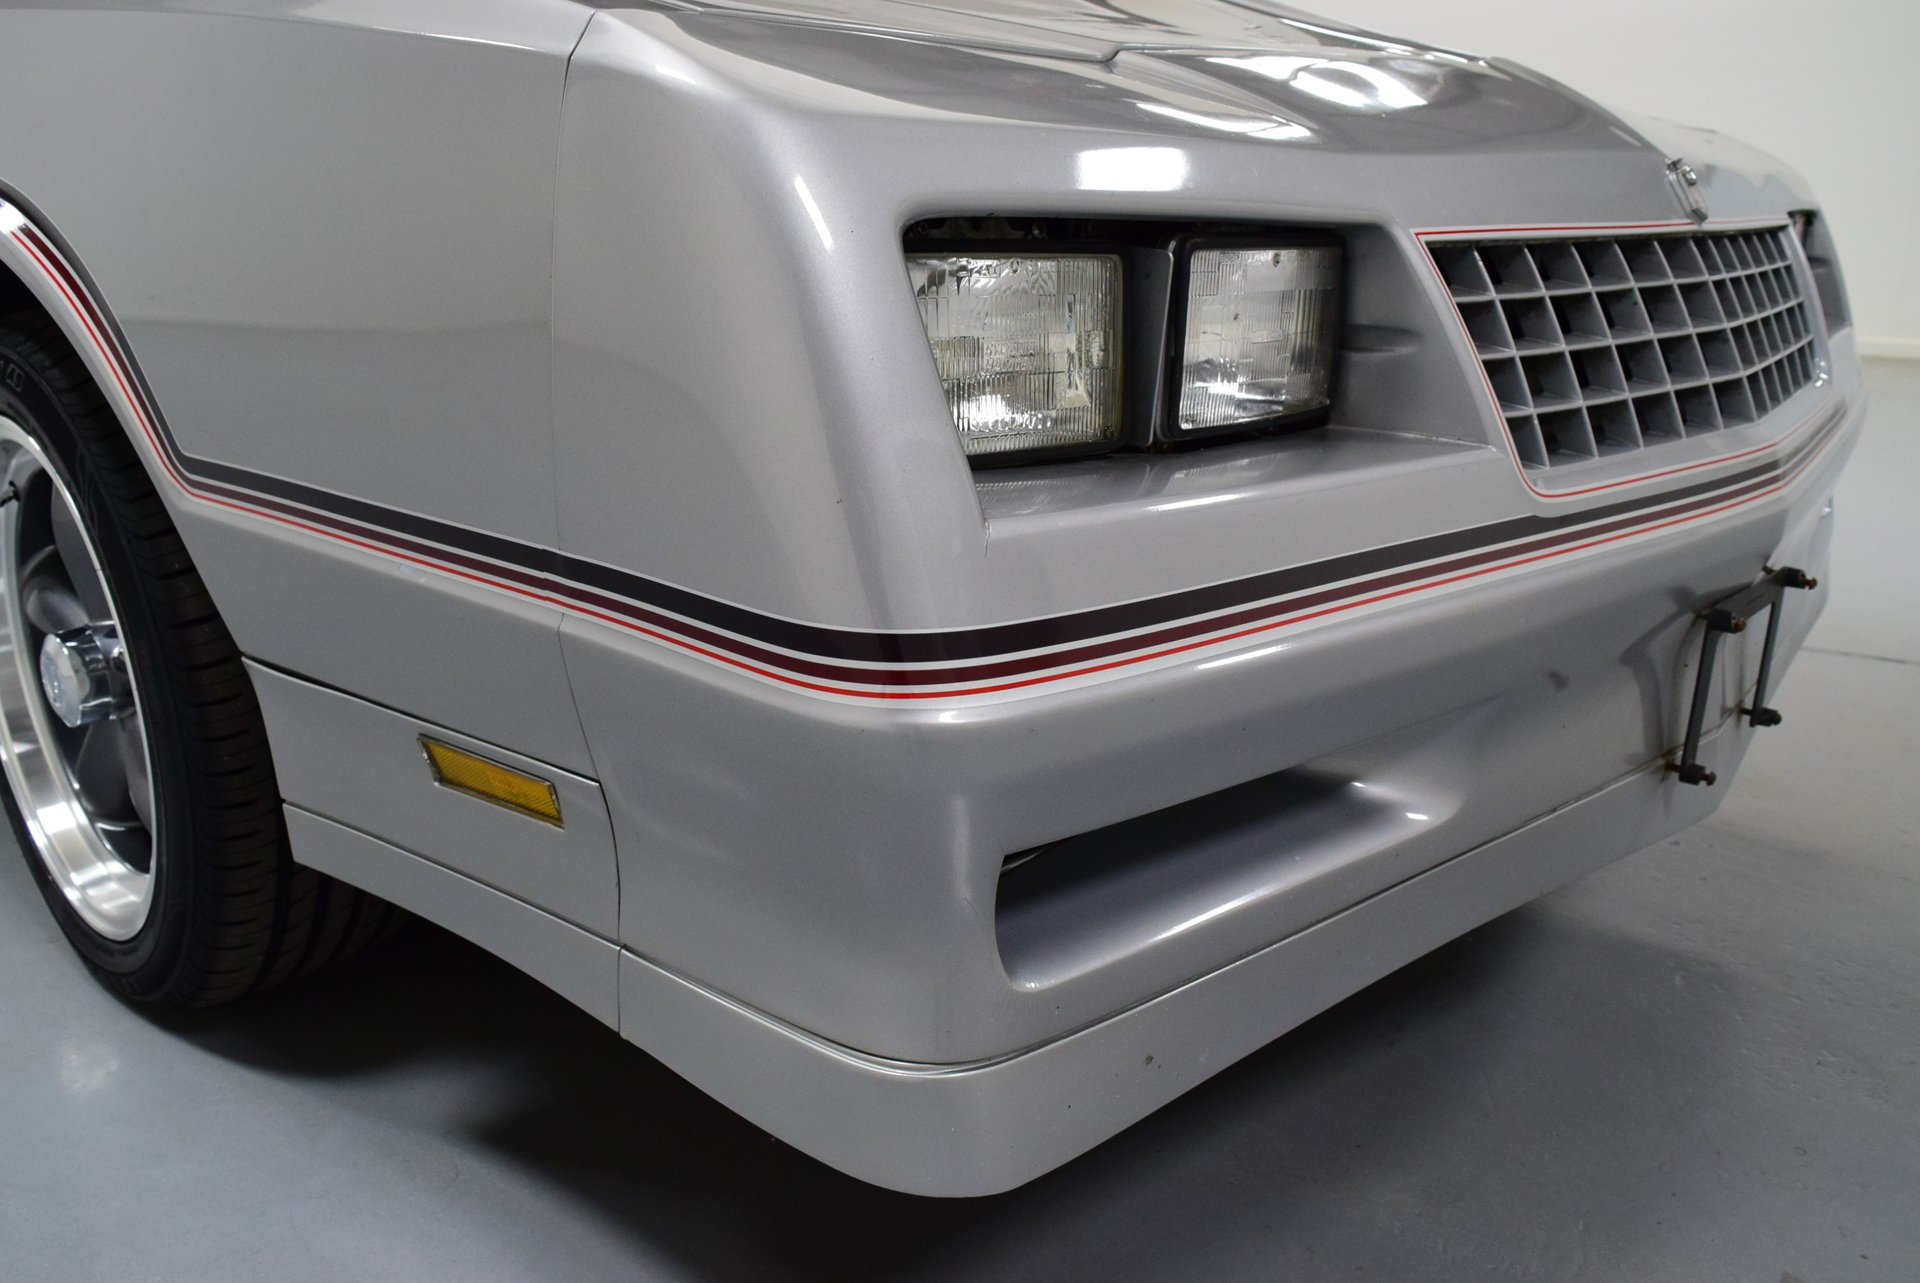 1985 Chevrolet Monte Carlo | Shelton Classics & Performance